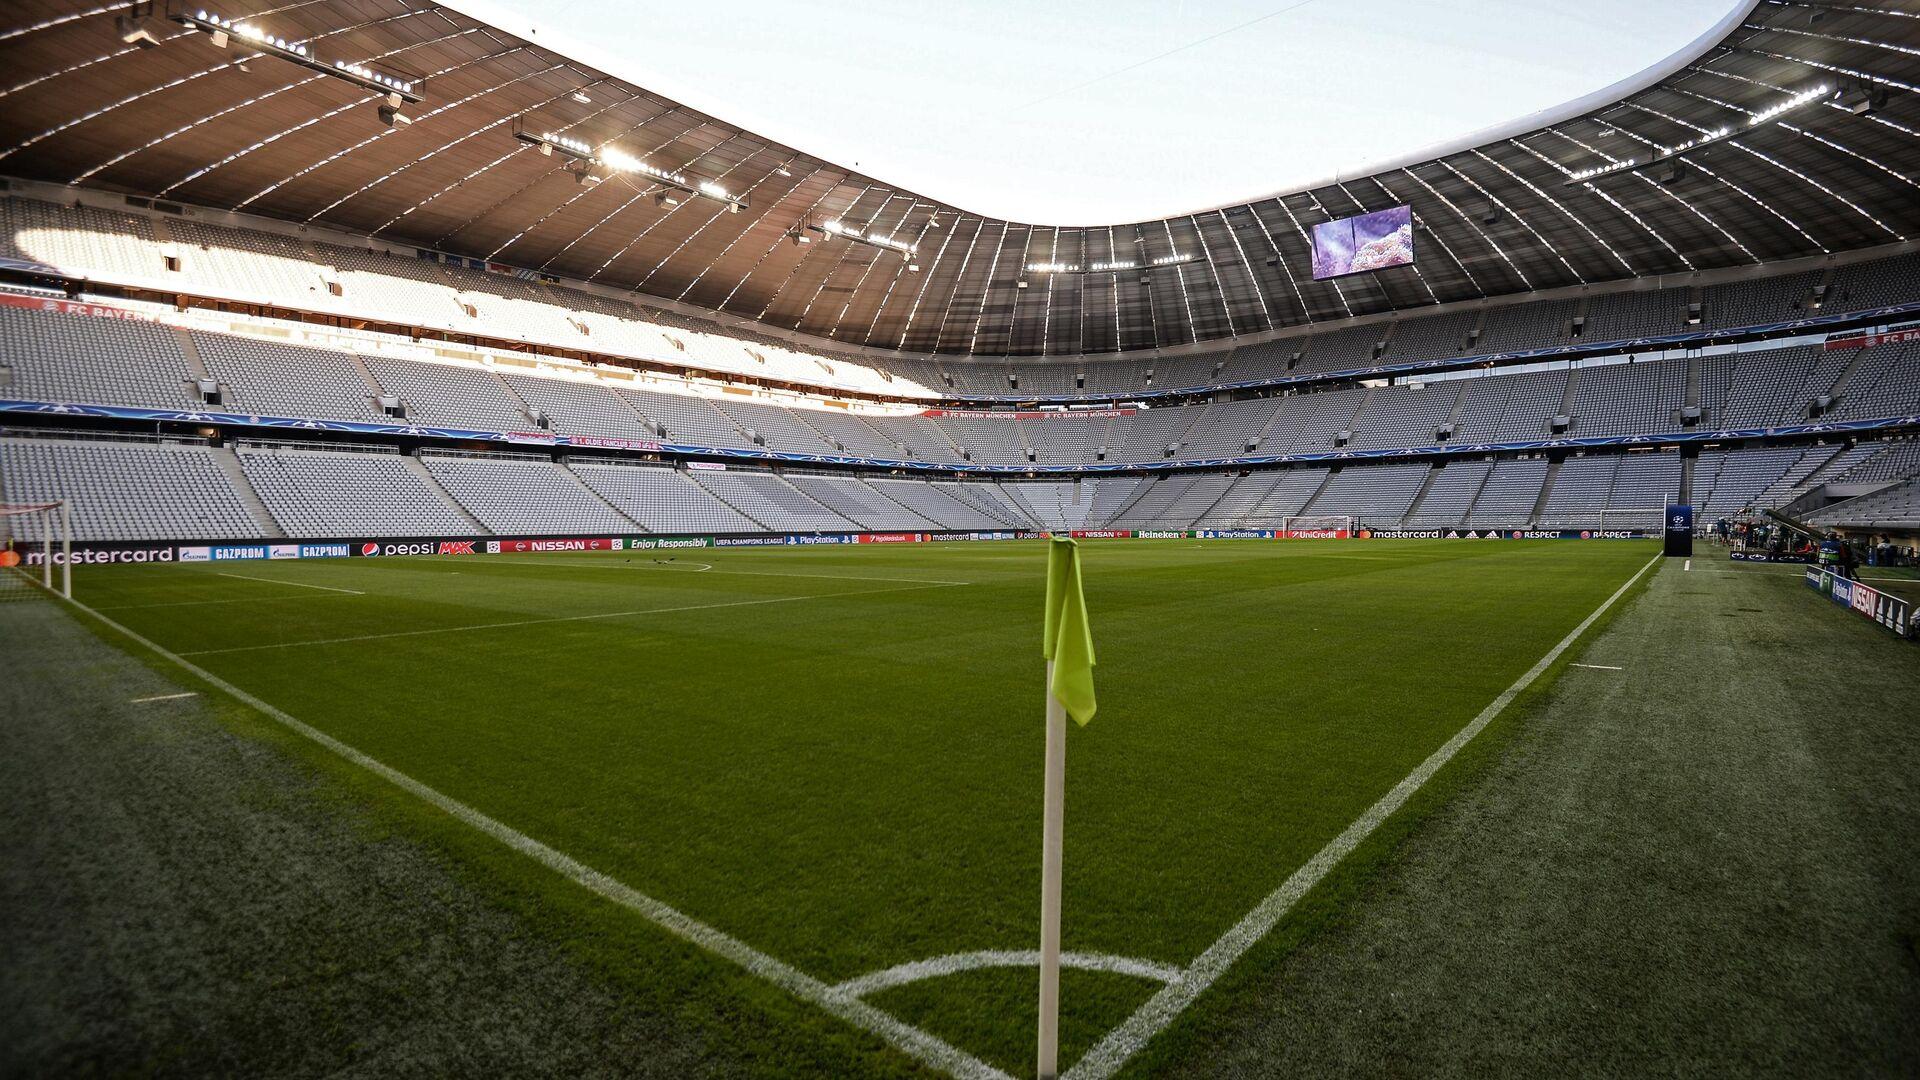 Стадион Альянс Арена в Мюнхене - РИА Новости, 1920, 06.04.2021